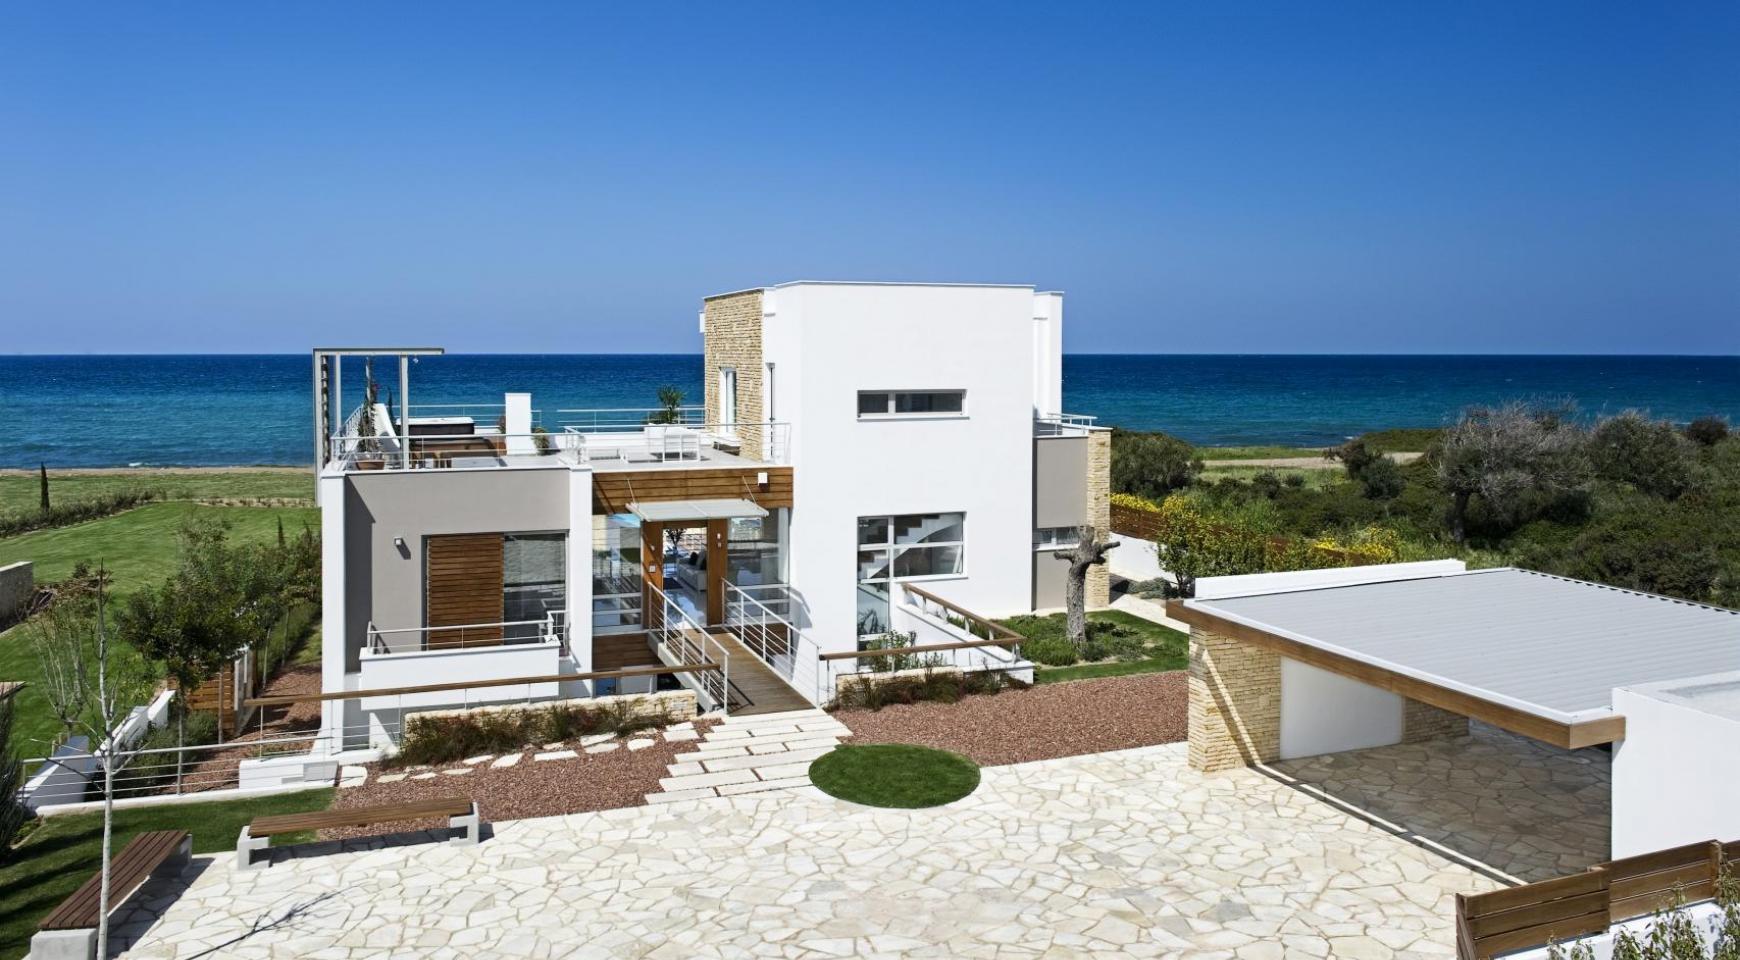 4 Bedroom Villa with Sea Views near Latsi - 2